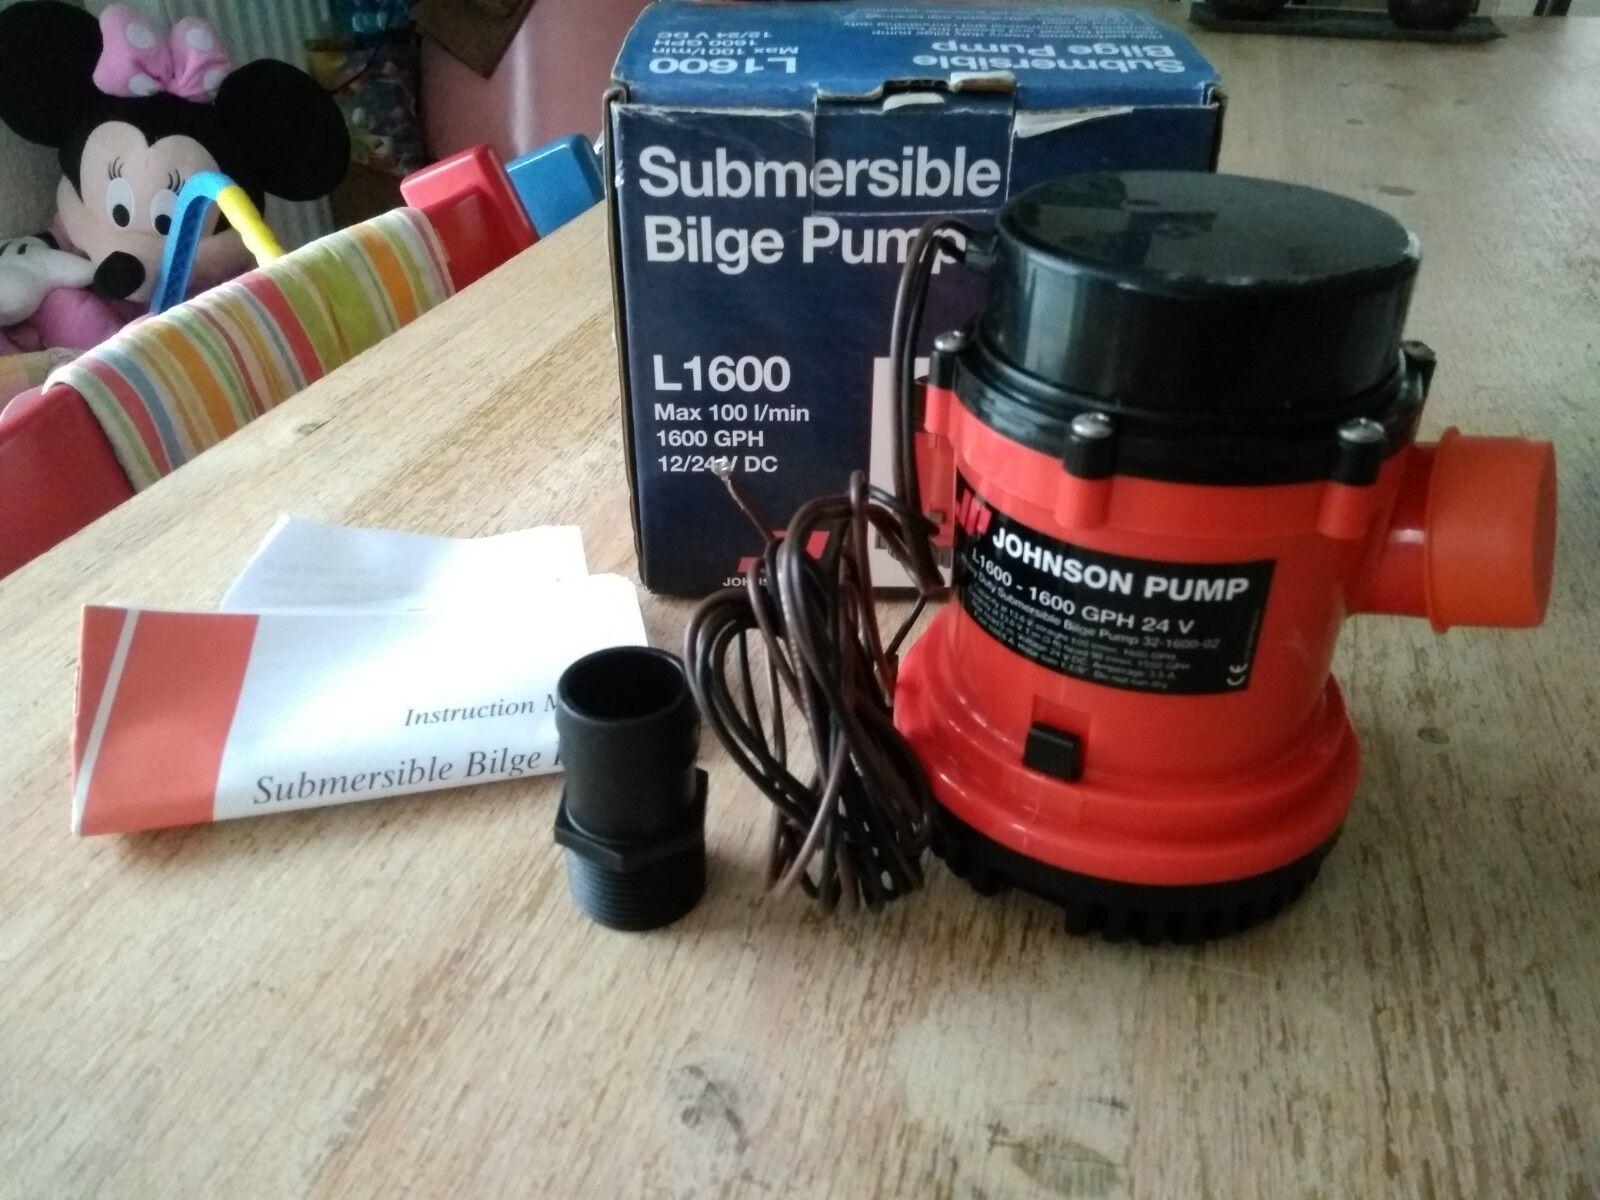 Submersible Bilge Pump L1600 1600 GPH  12/24 V V V DC Max 100l min Tauch Pumpe Stiefel 5a458d